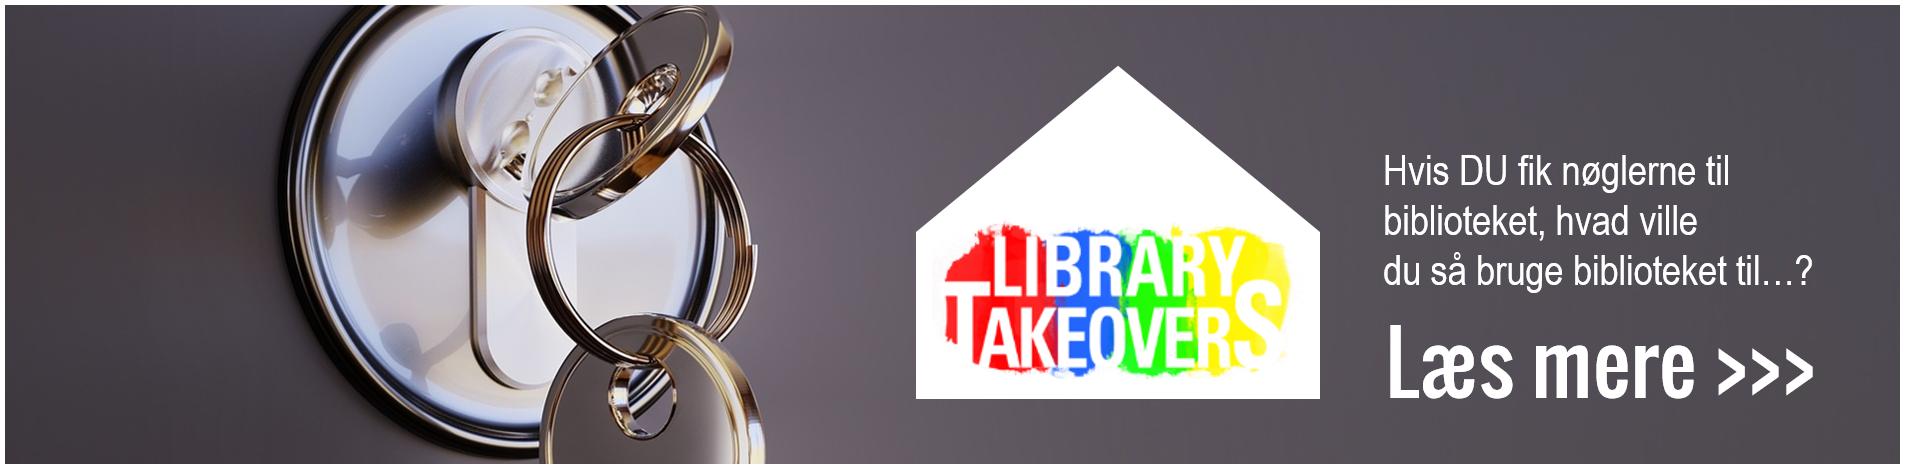 nøgler og Library Takeovers logo